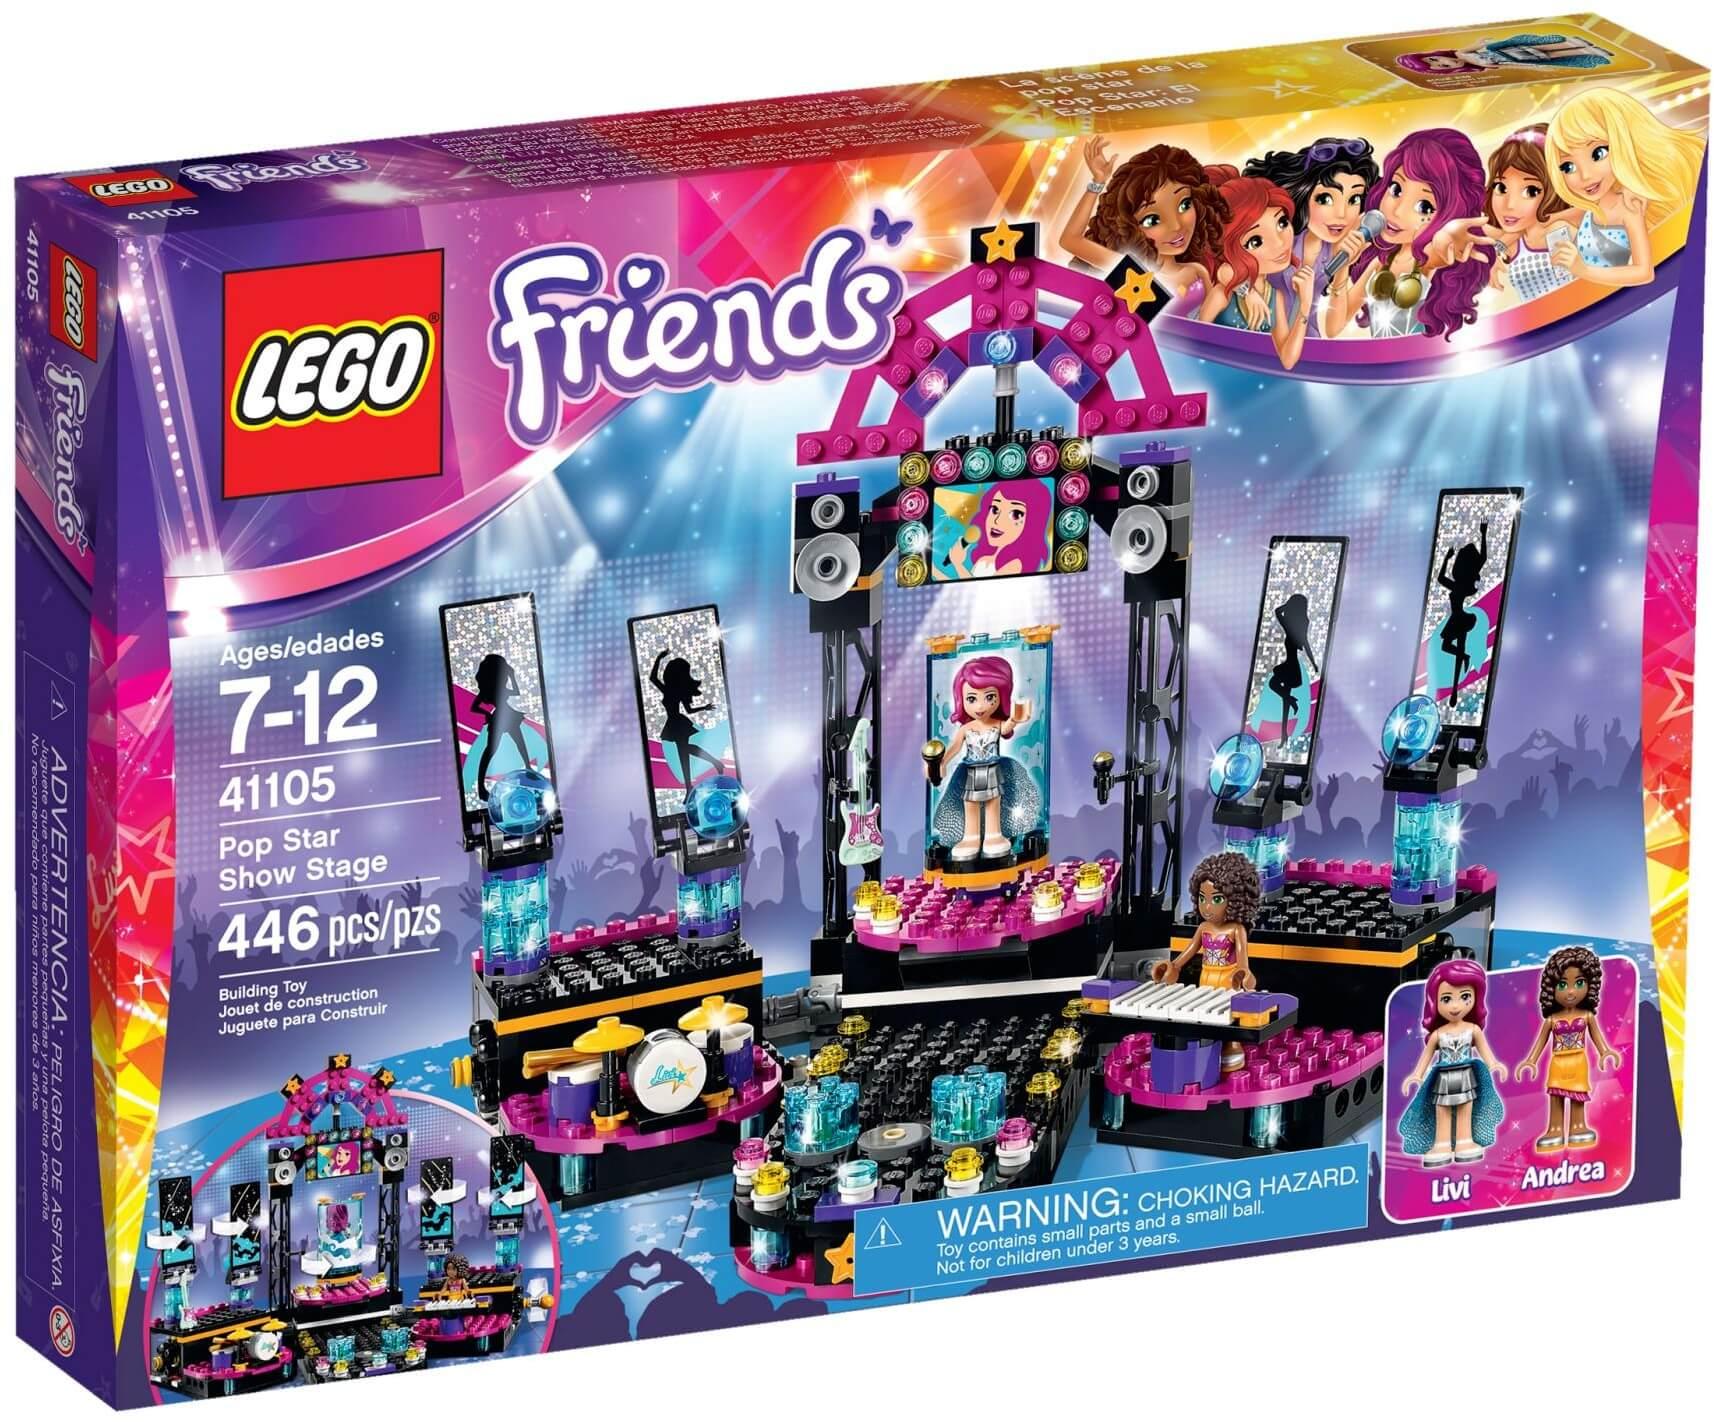 Mua đồ chơi LEGO 41105 - LEGO Friends 41105 - Sân Khấu Của Siêu Sao (LEGO Friends Pop Star Show Stage 41105)